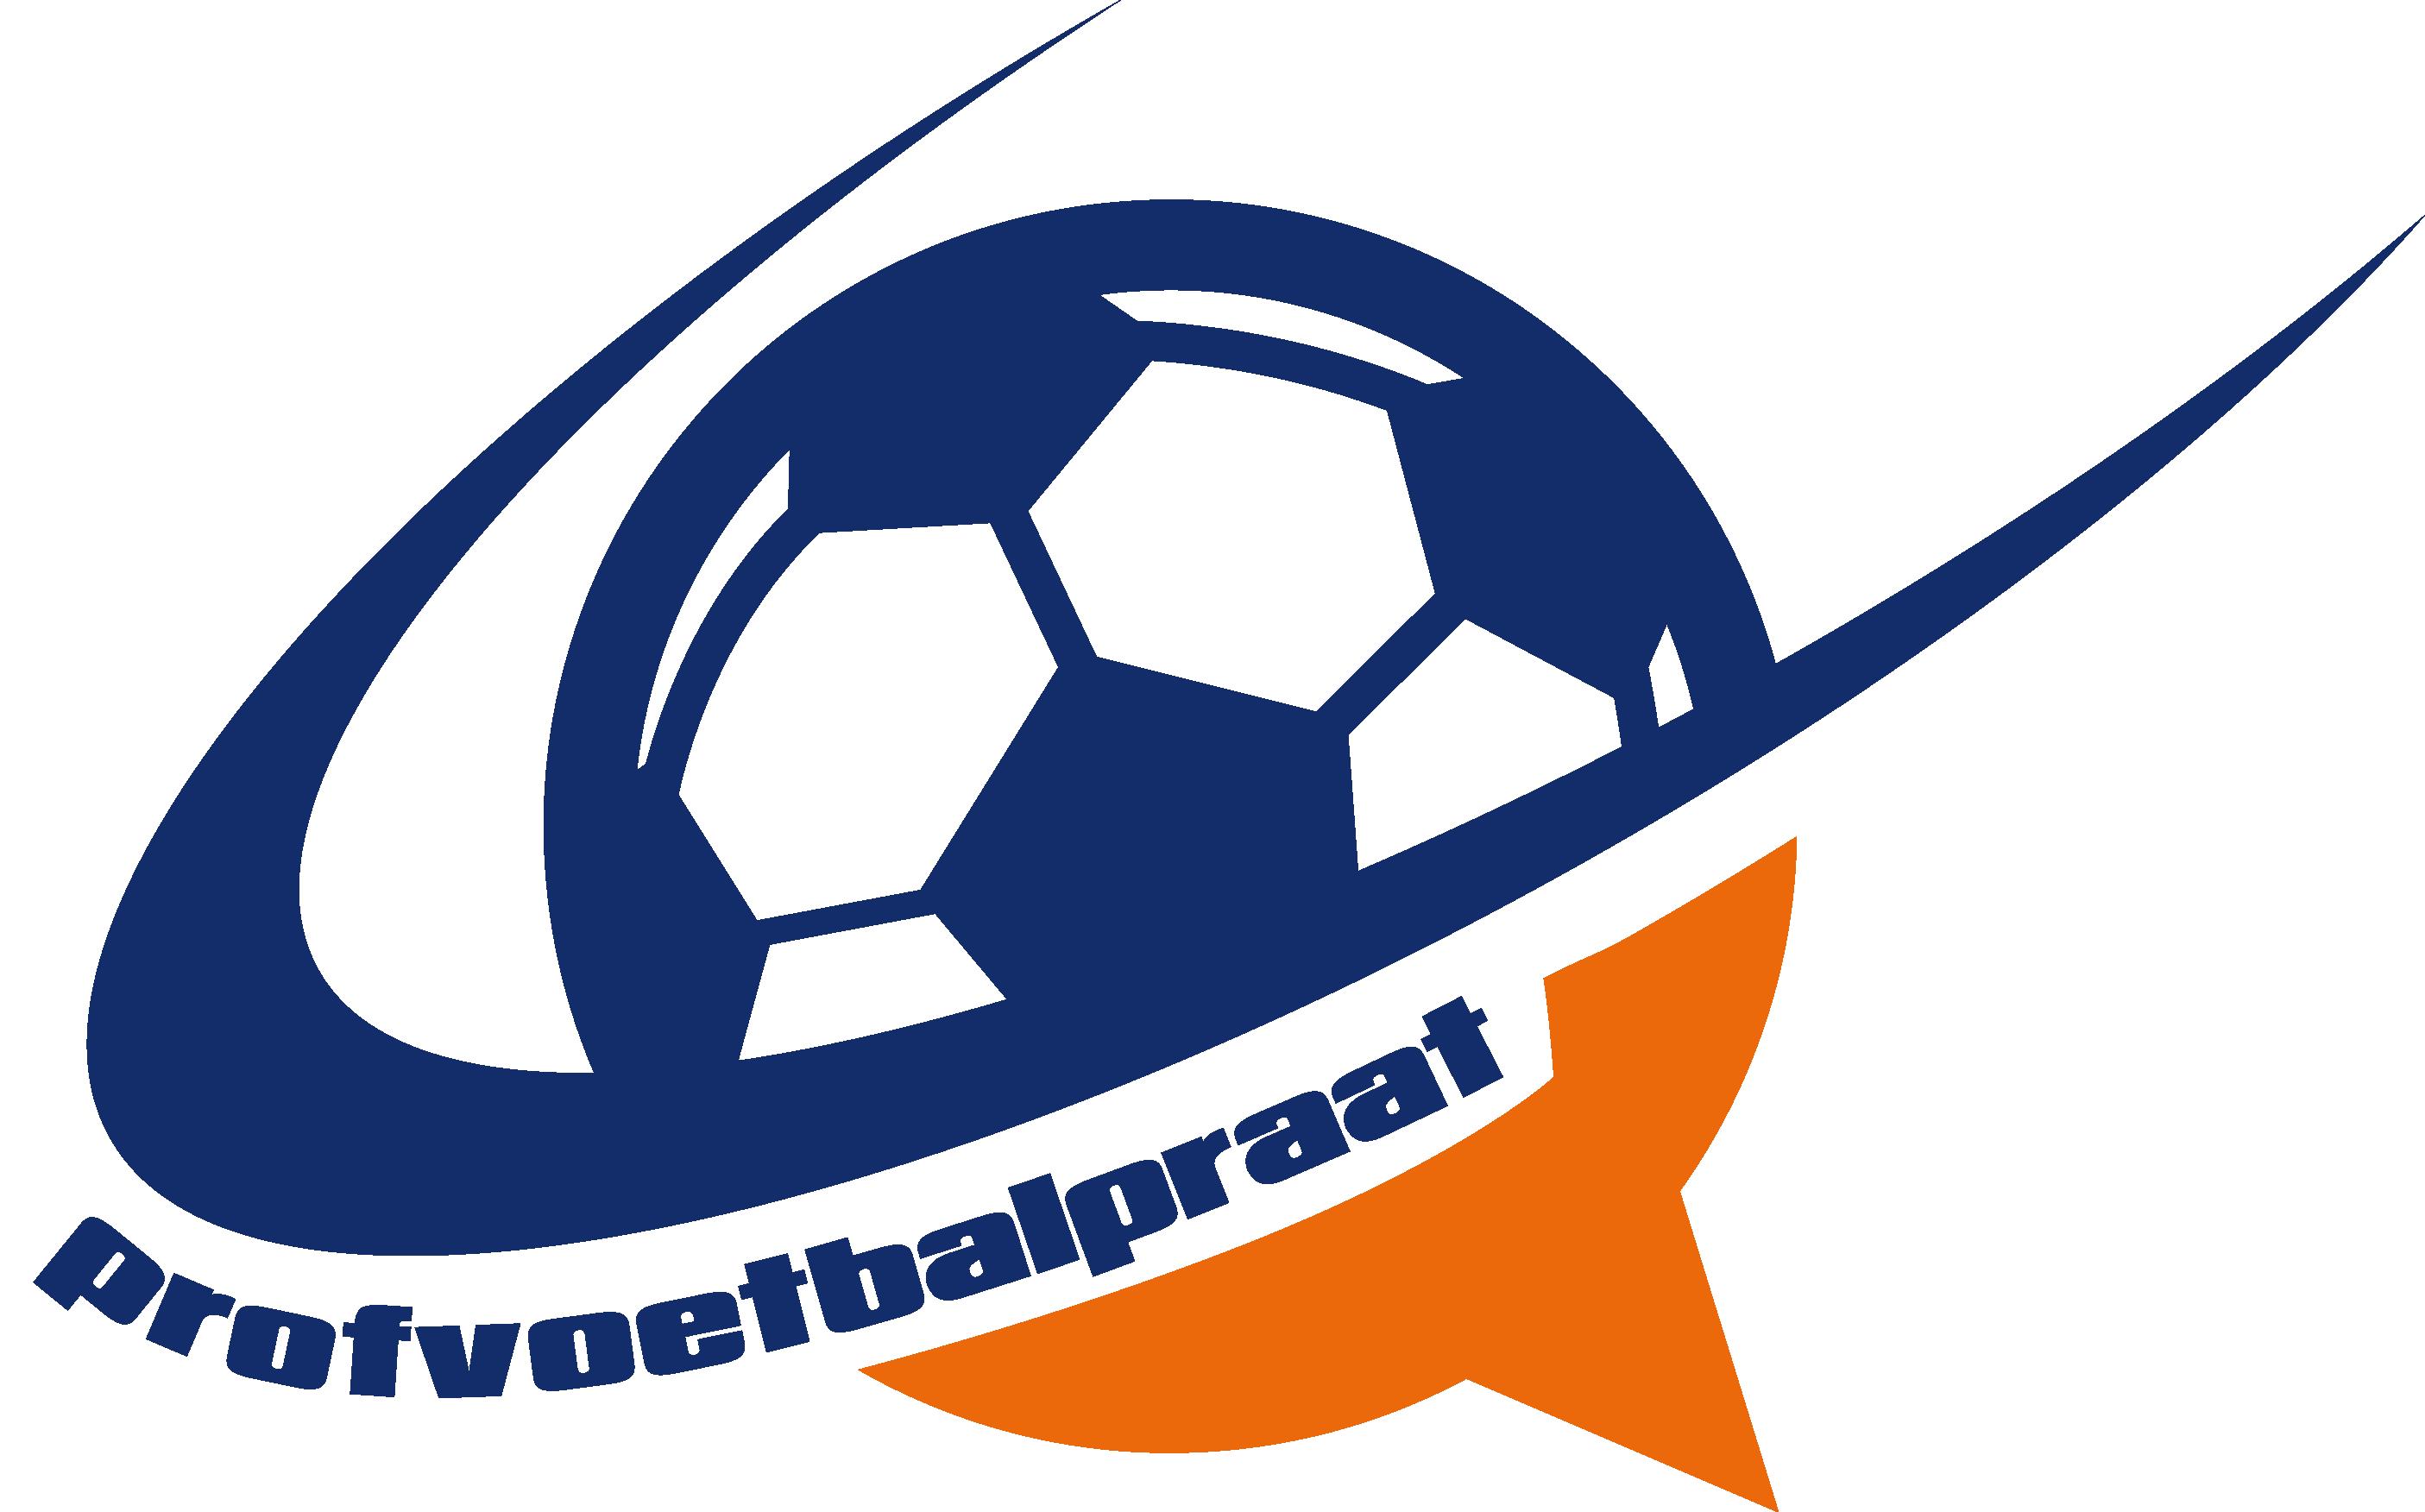 Profvoetbalpraat